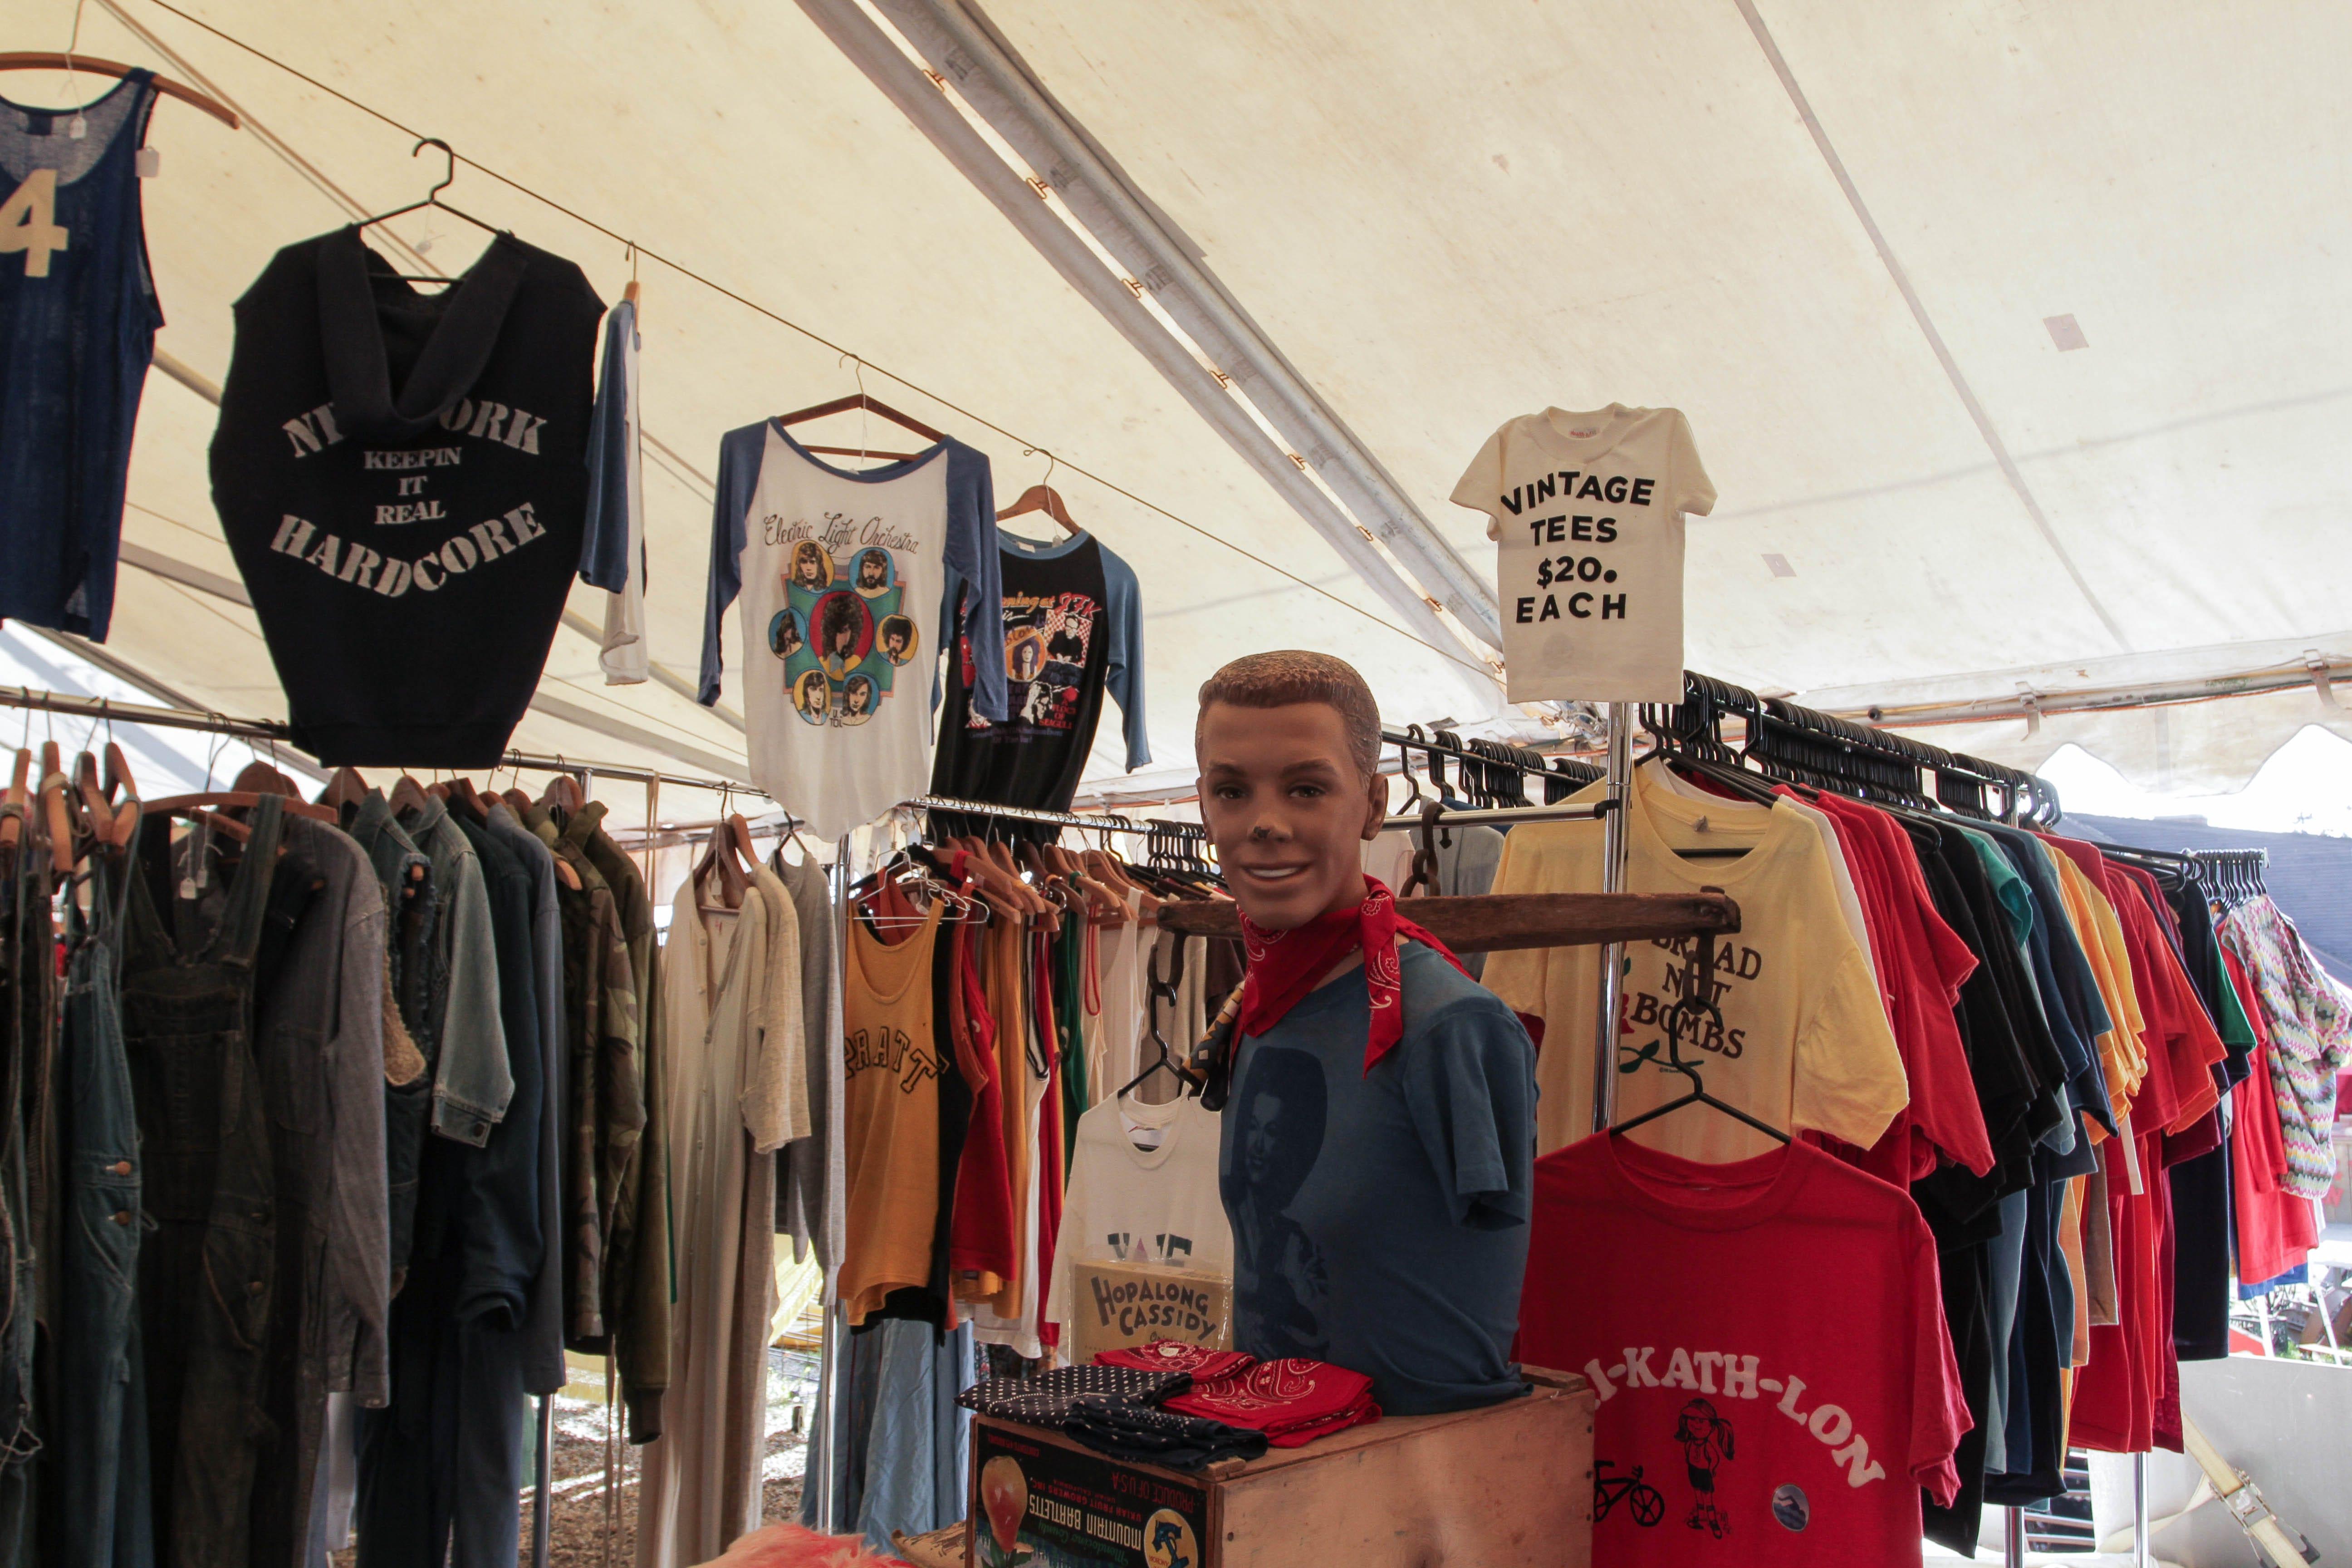 Brimfield MA Flea Market Guide - How To Shop Vintage